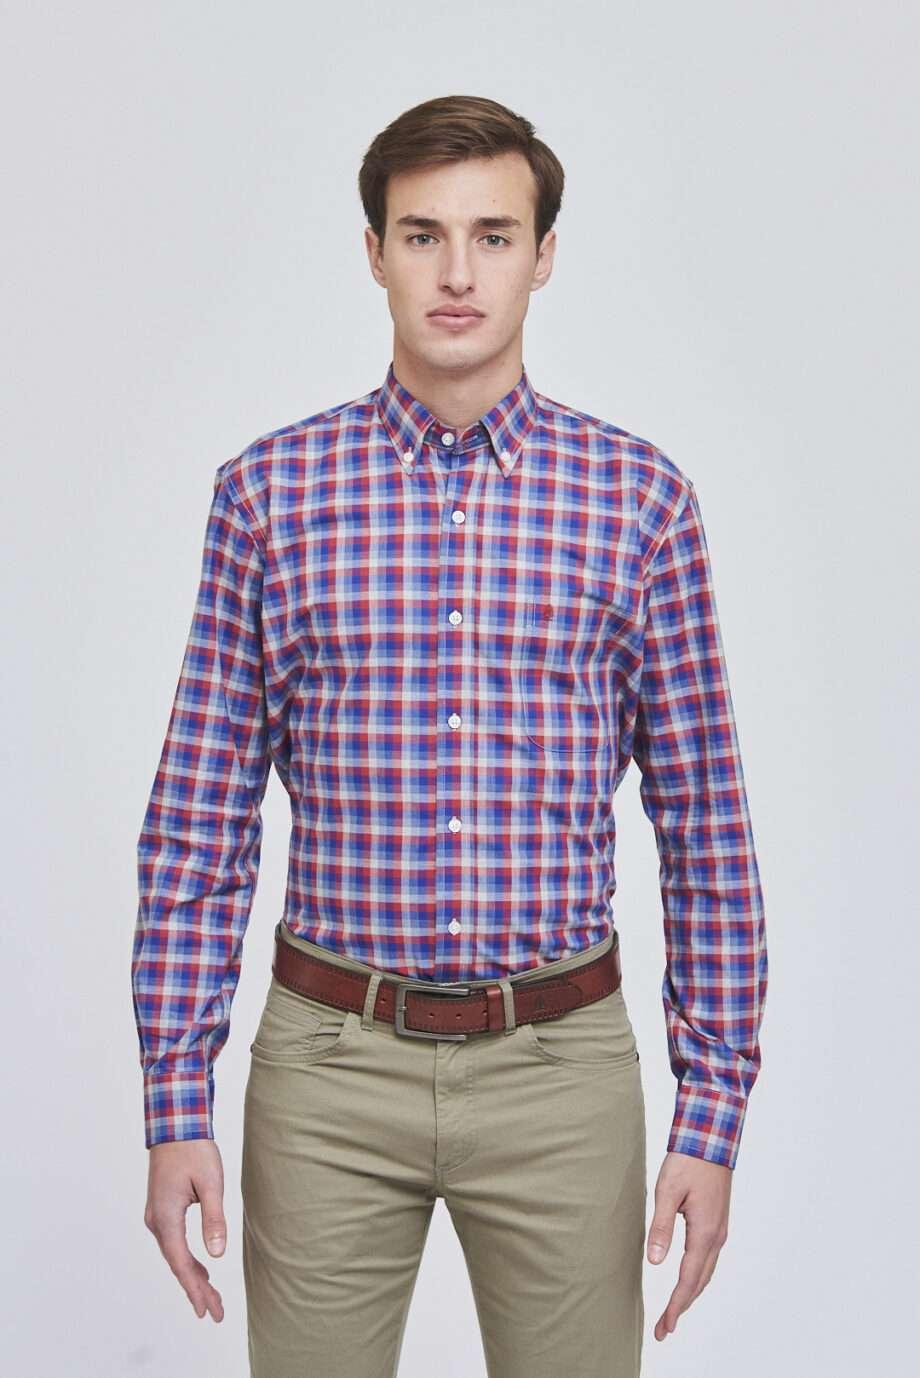 Camisa mangas largas regular fit a cuadros de algodón pima